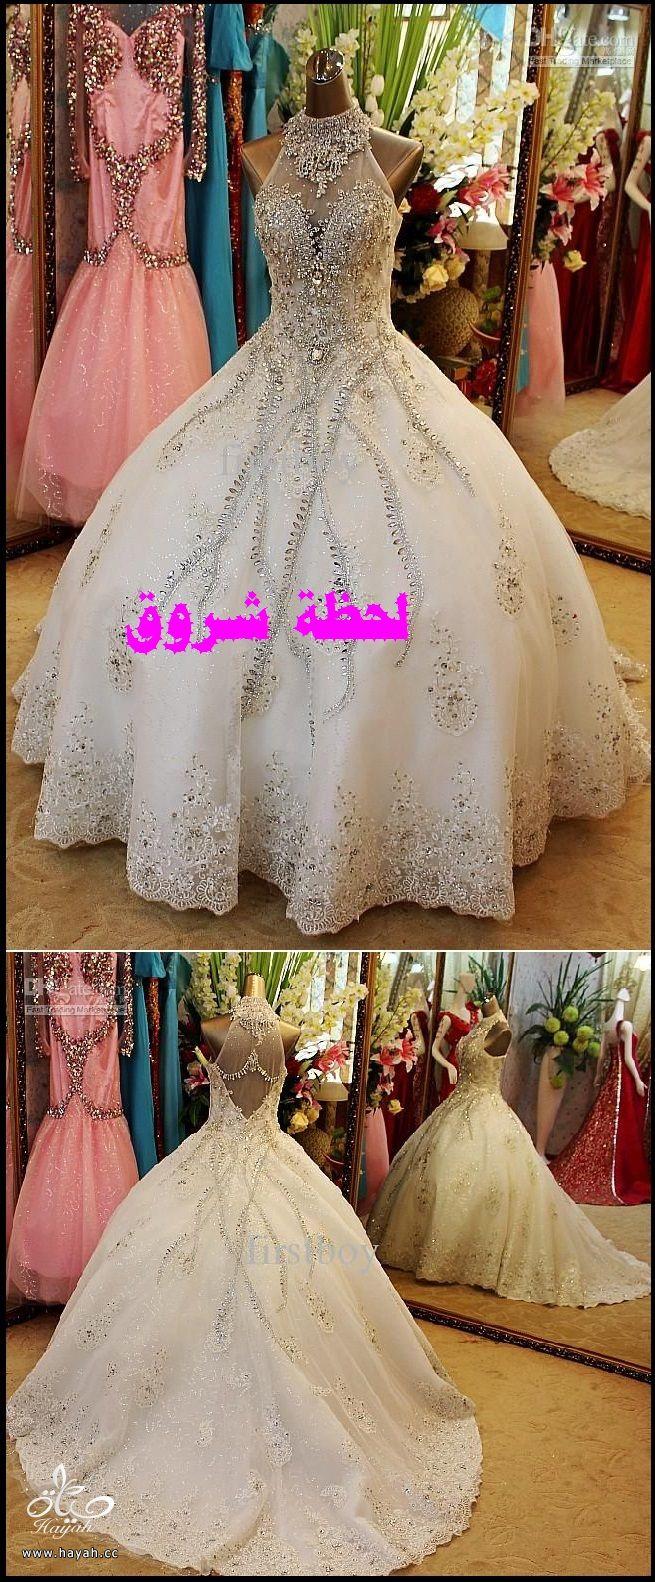 فساتين زفاف hayahcc_1436131815_294.jpg